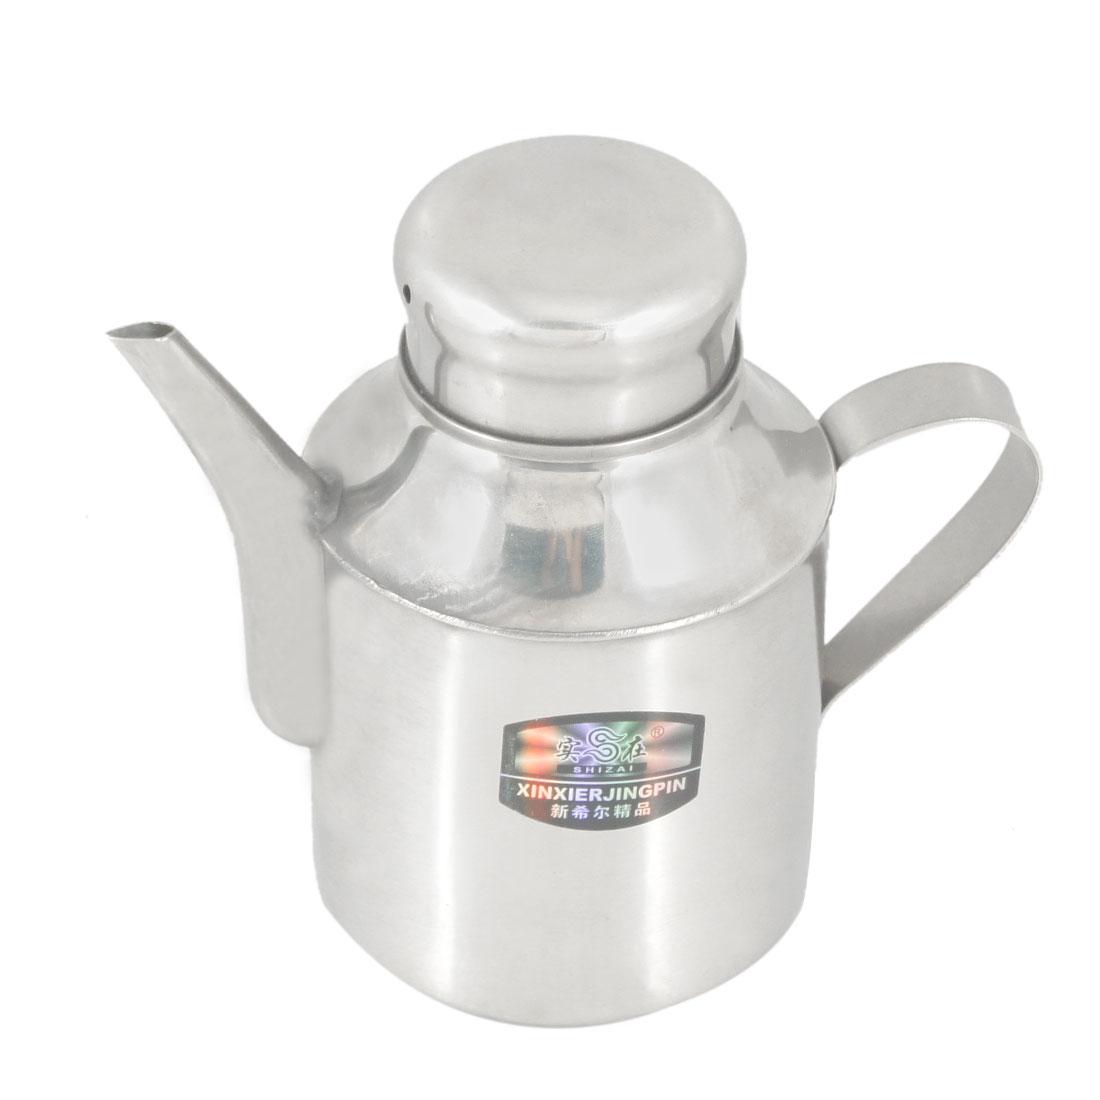 110Z Capacity Pitcher Shape Tea Pot Kettle Teakettle Silver Tone